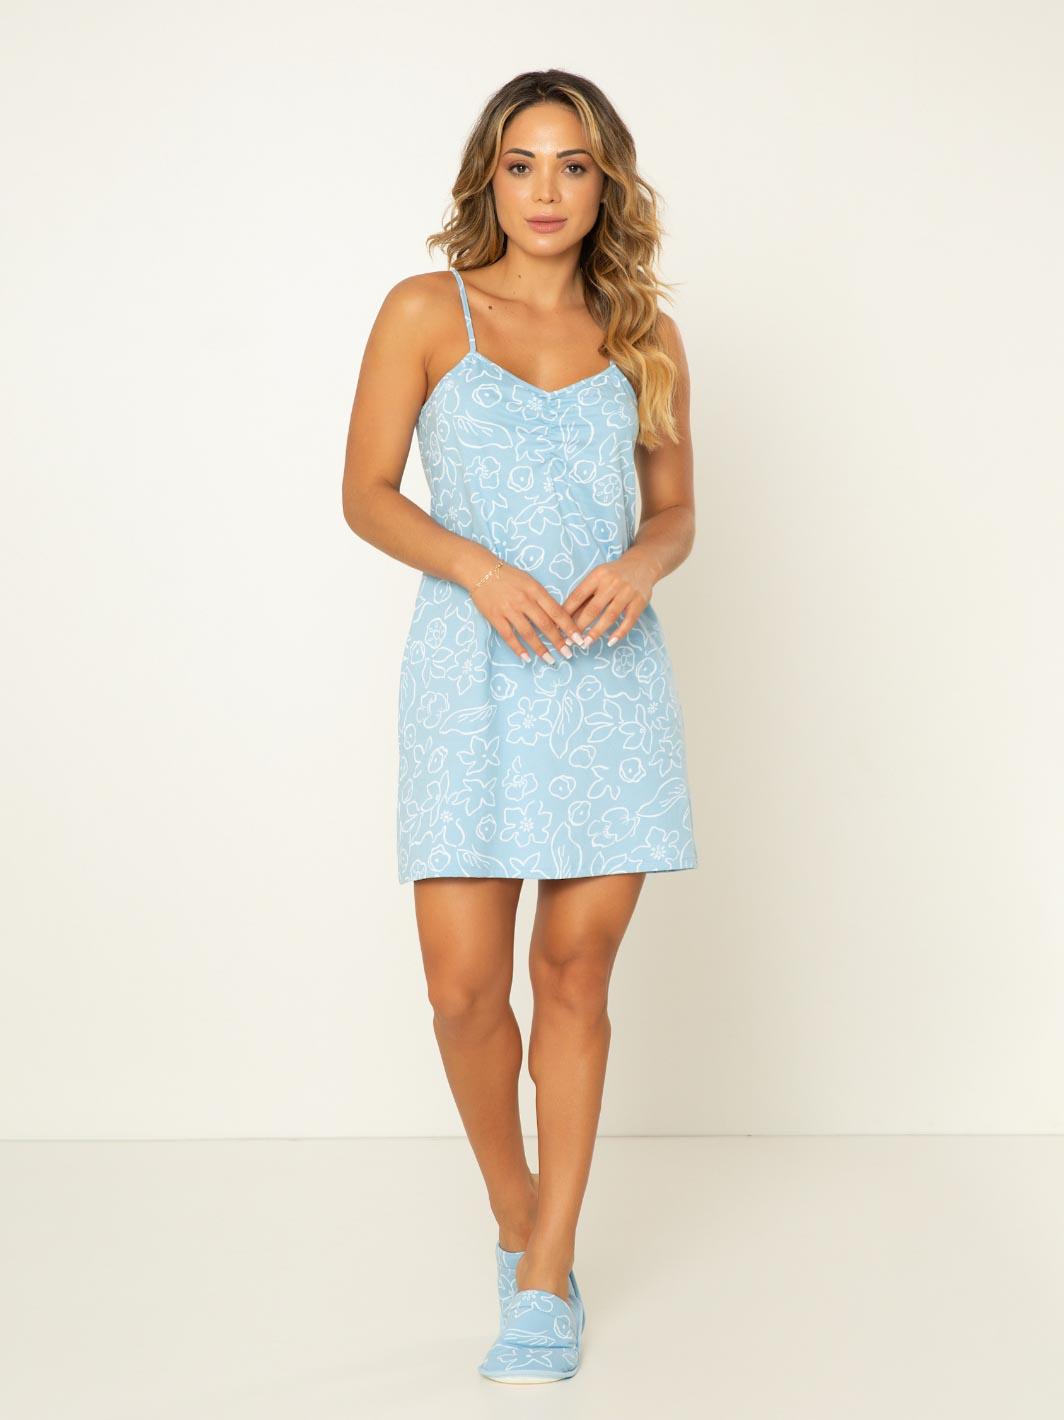 Camisola Estampada Sandy - Azul